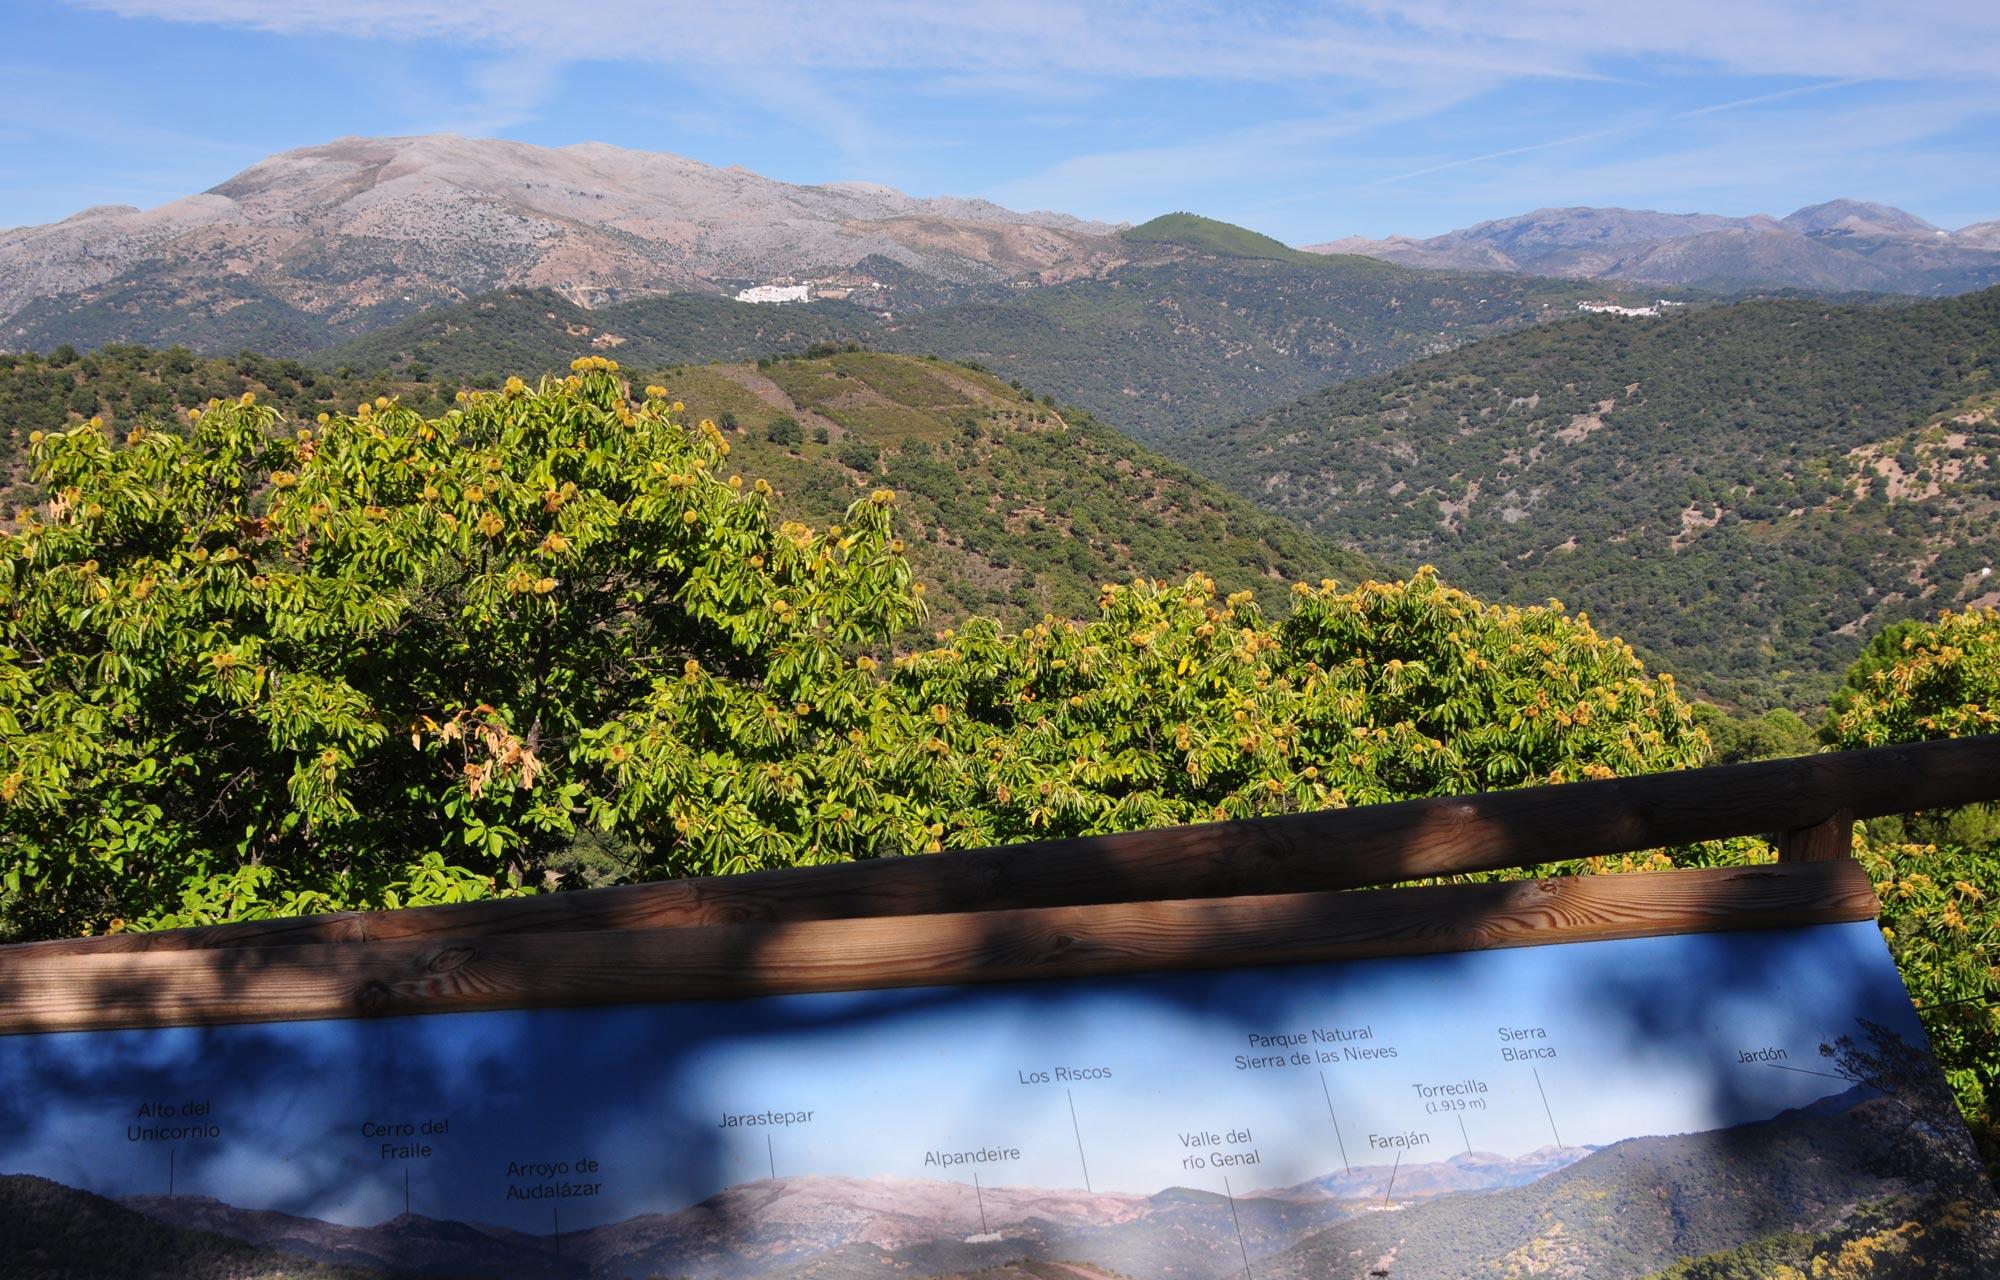 Wandelen in Andalusië GR-141 wandelroute